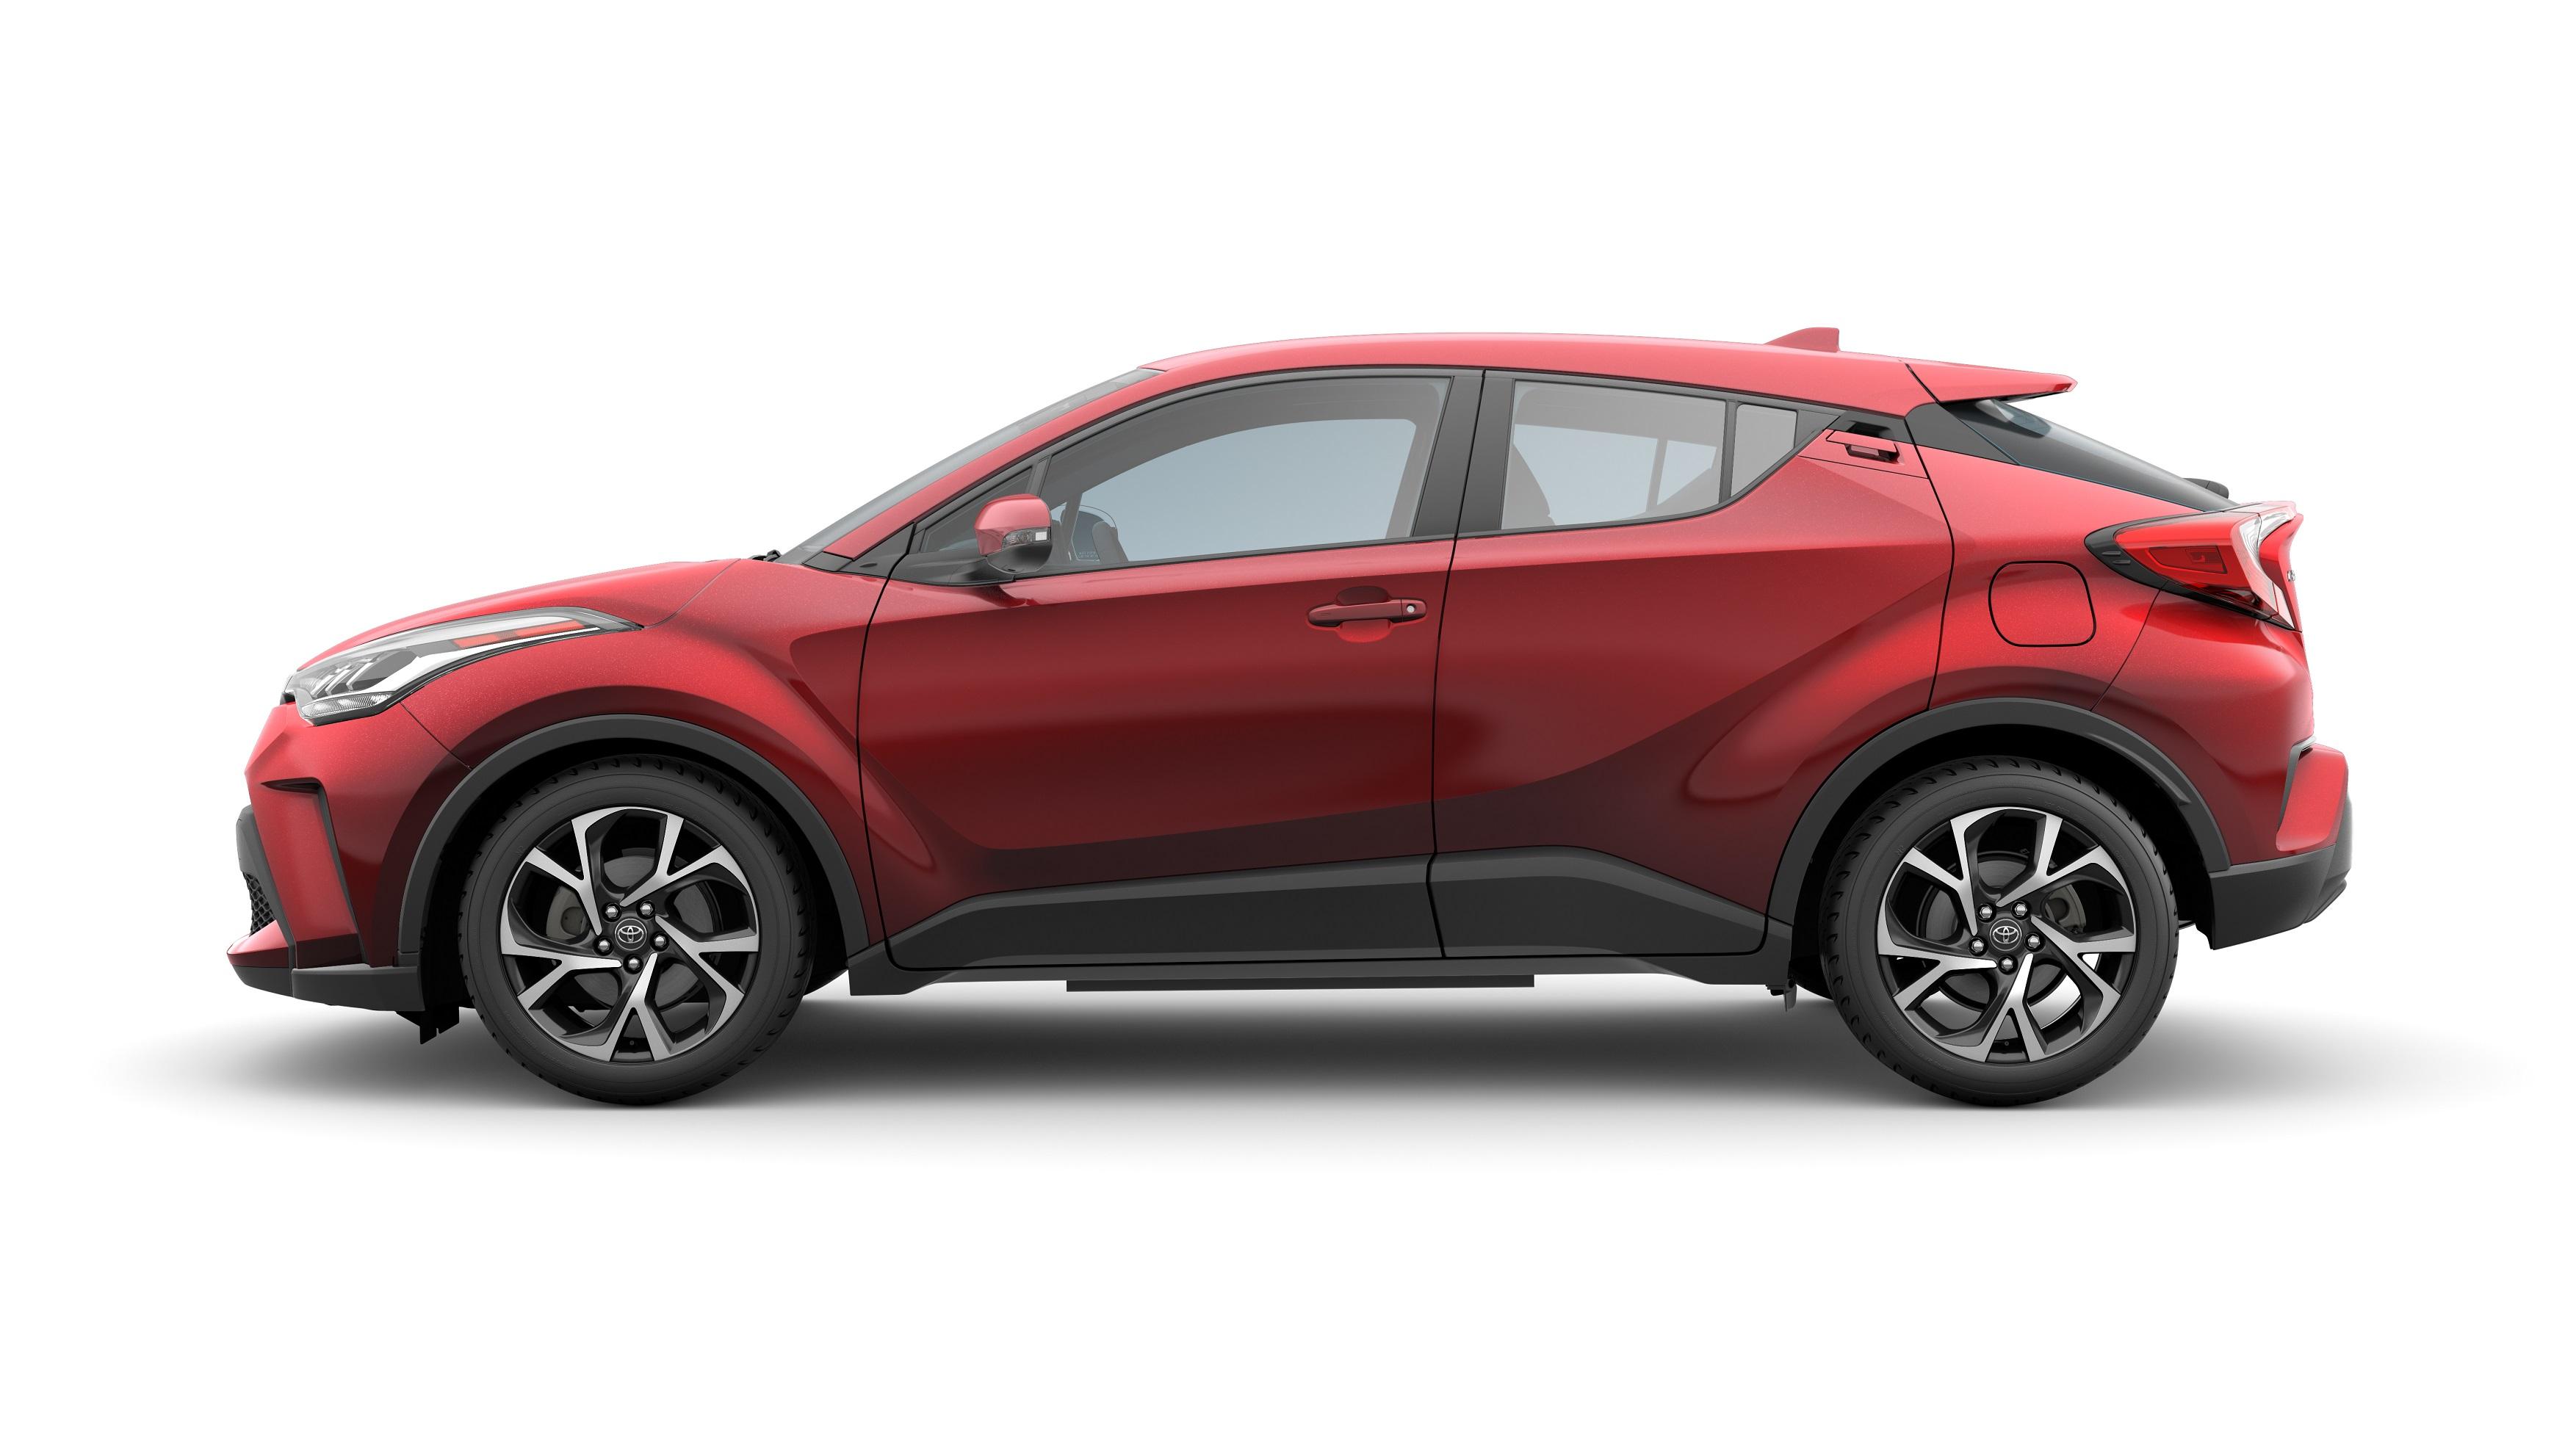 Kelebihan Toyota Chr 2020 Spesifikasi